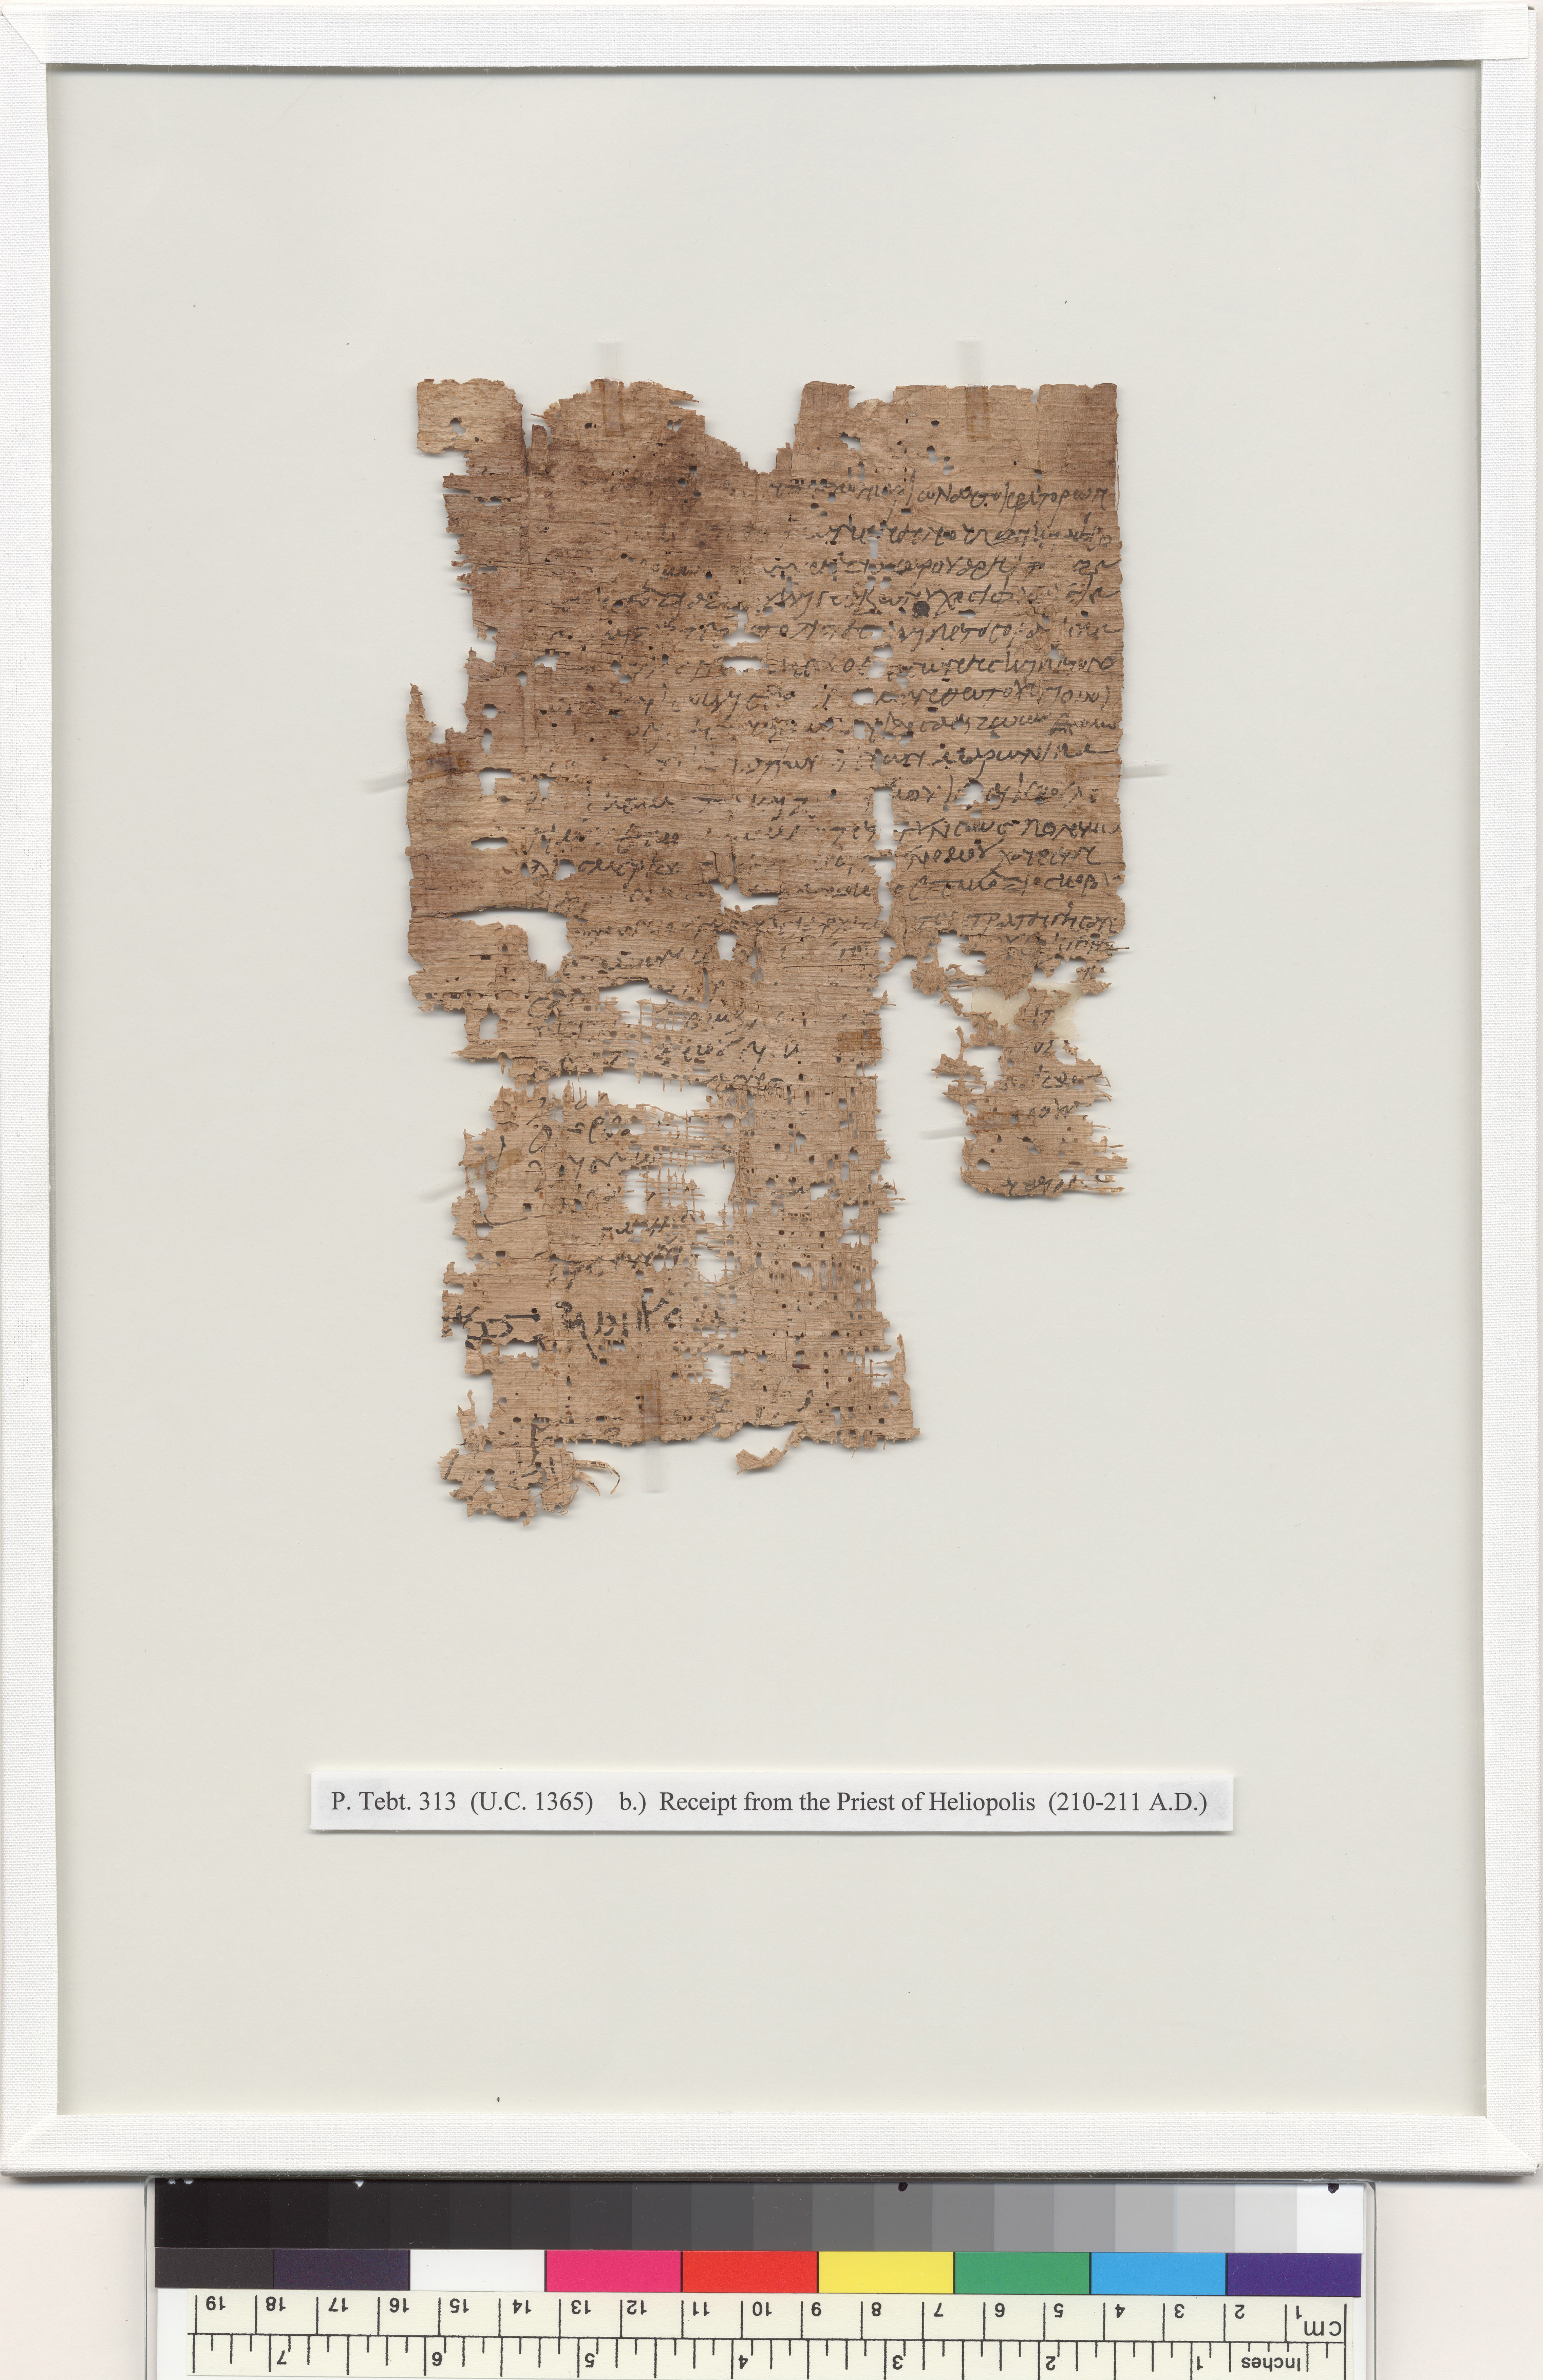 P.Tebt. 313